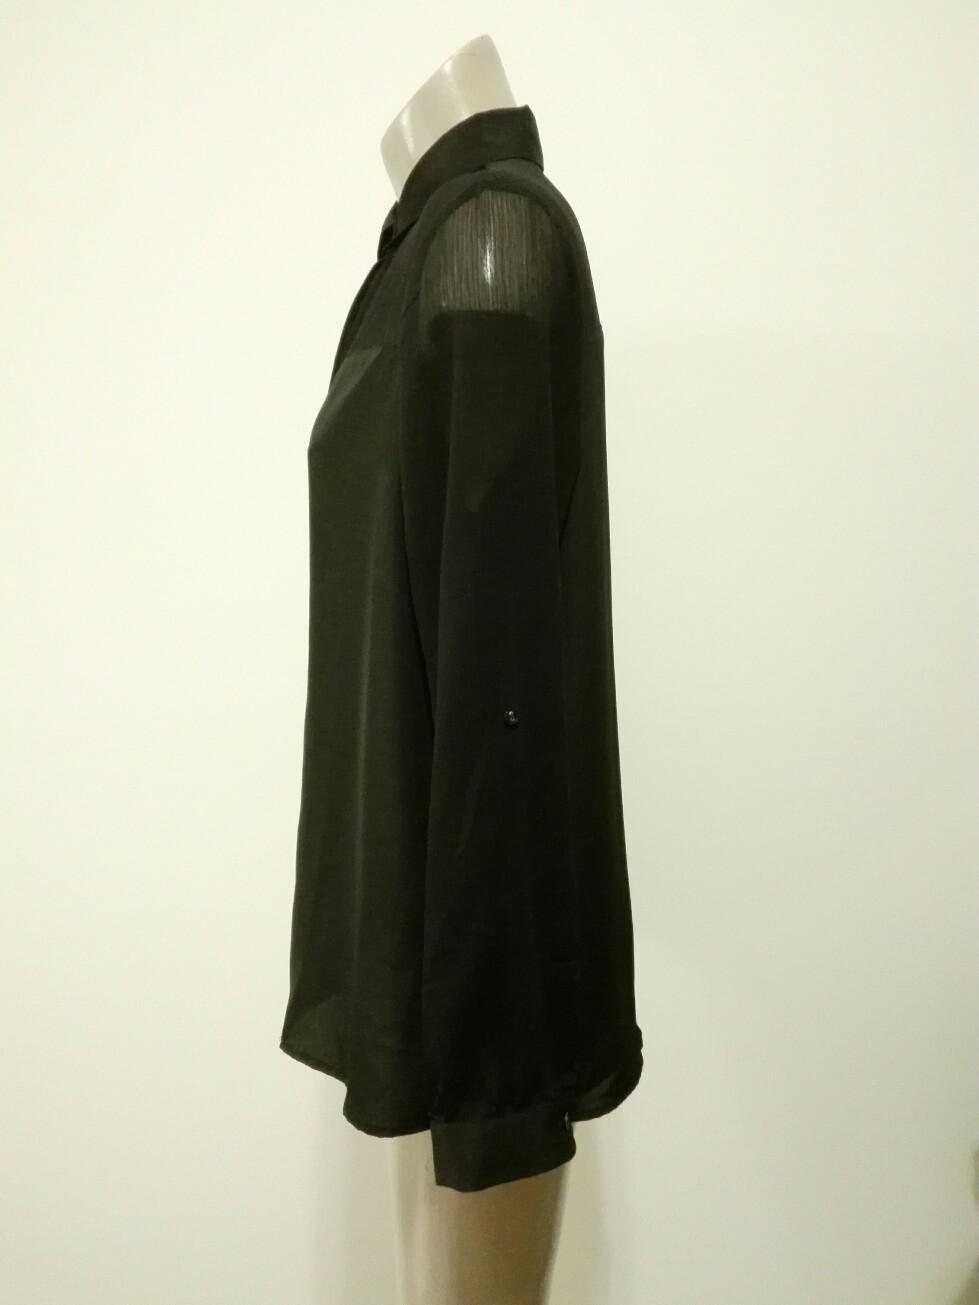 Jeans West Black Shirt Size 12 Preloved For Relove